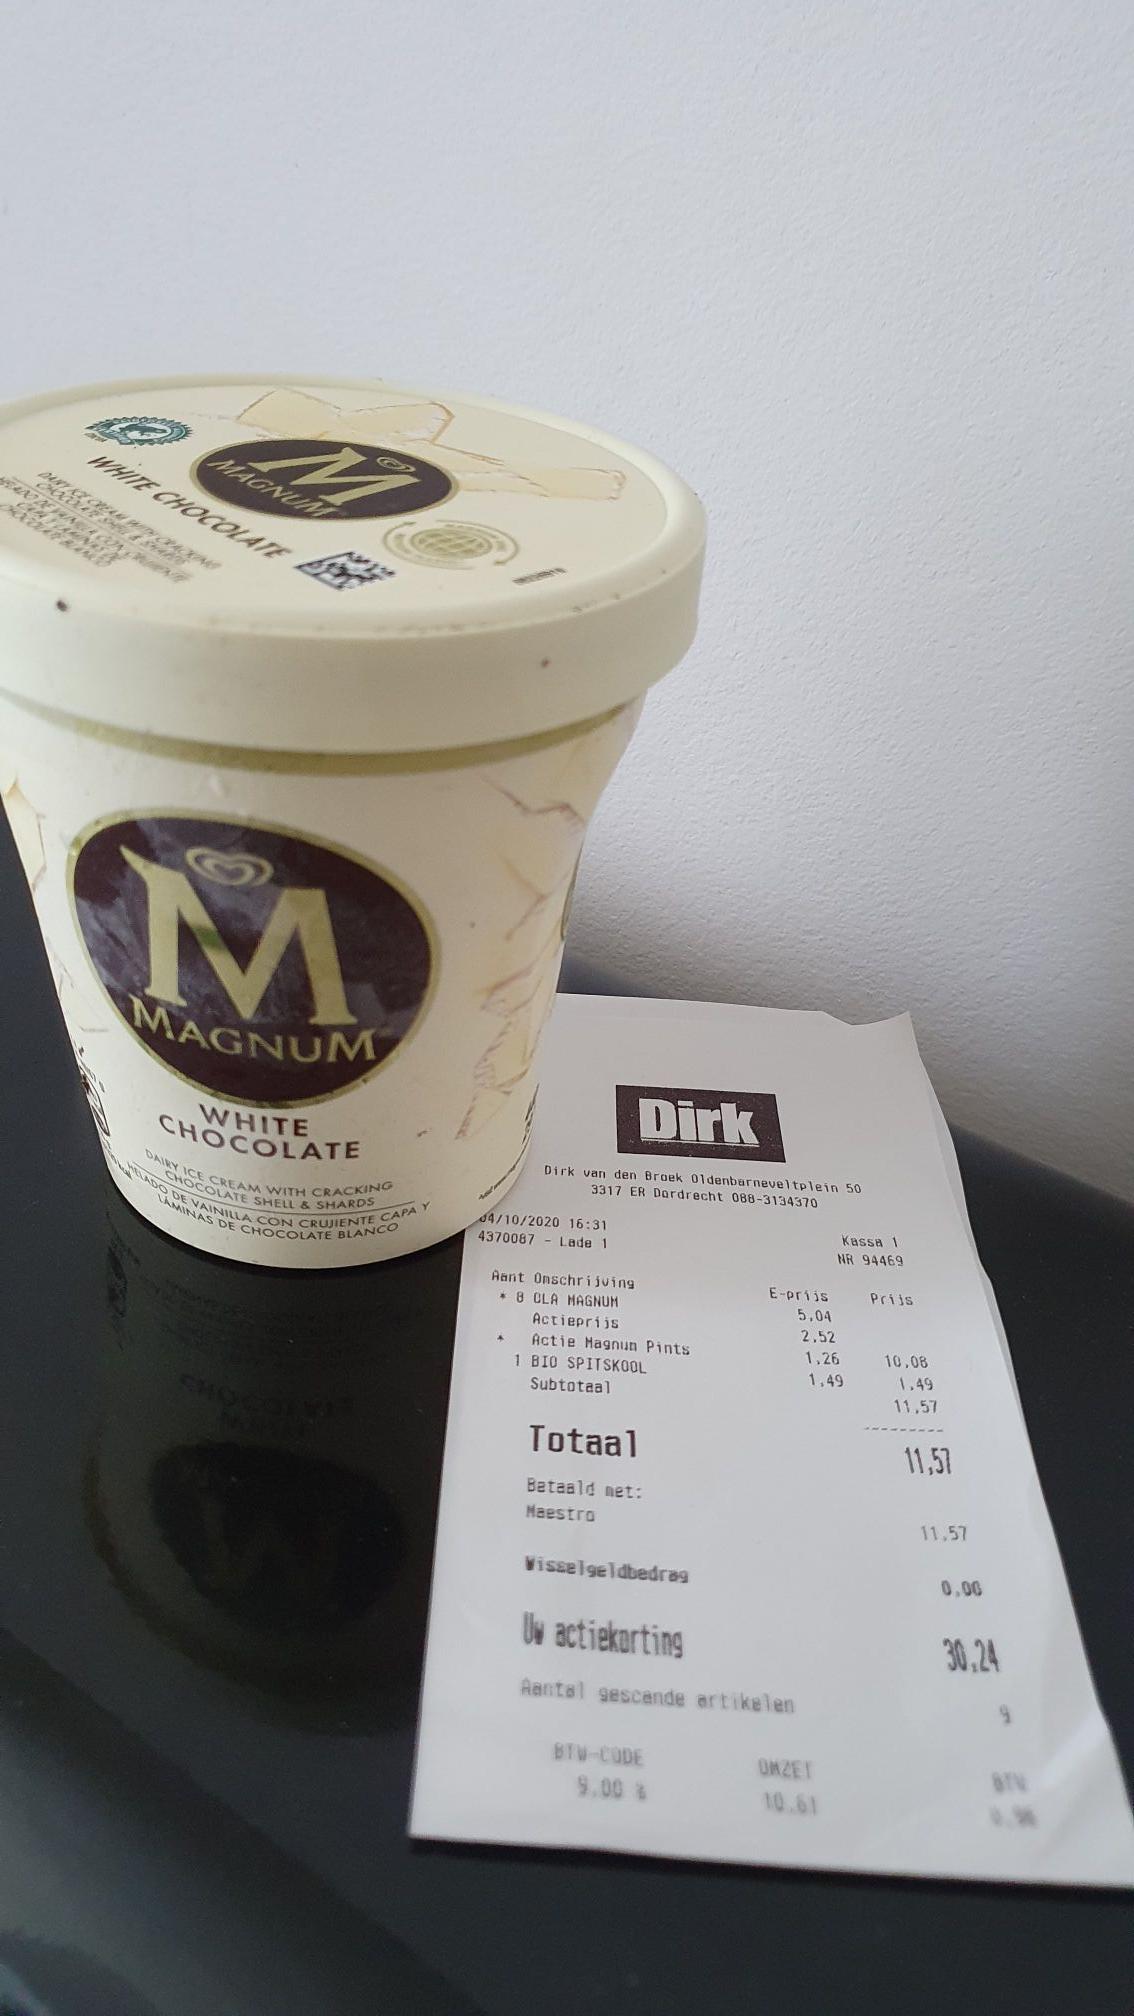 Magnum White Chocolate pints 2 stuks voor €2.52